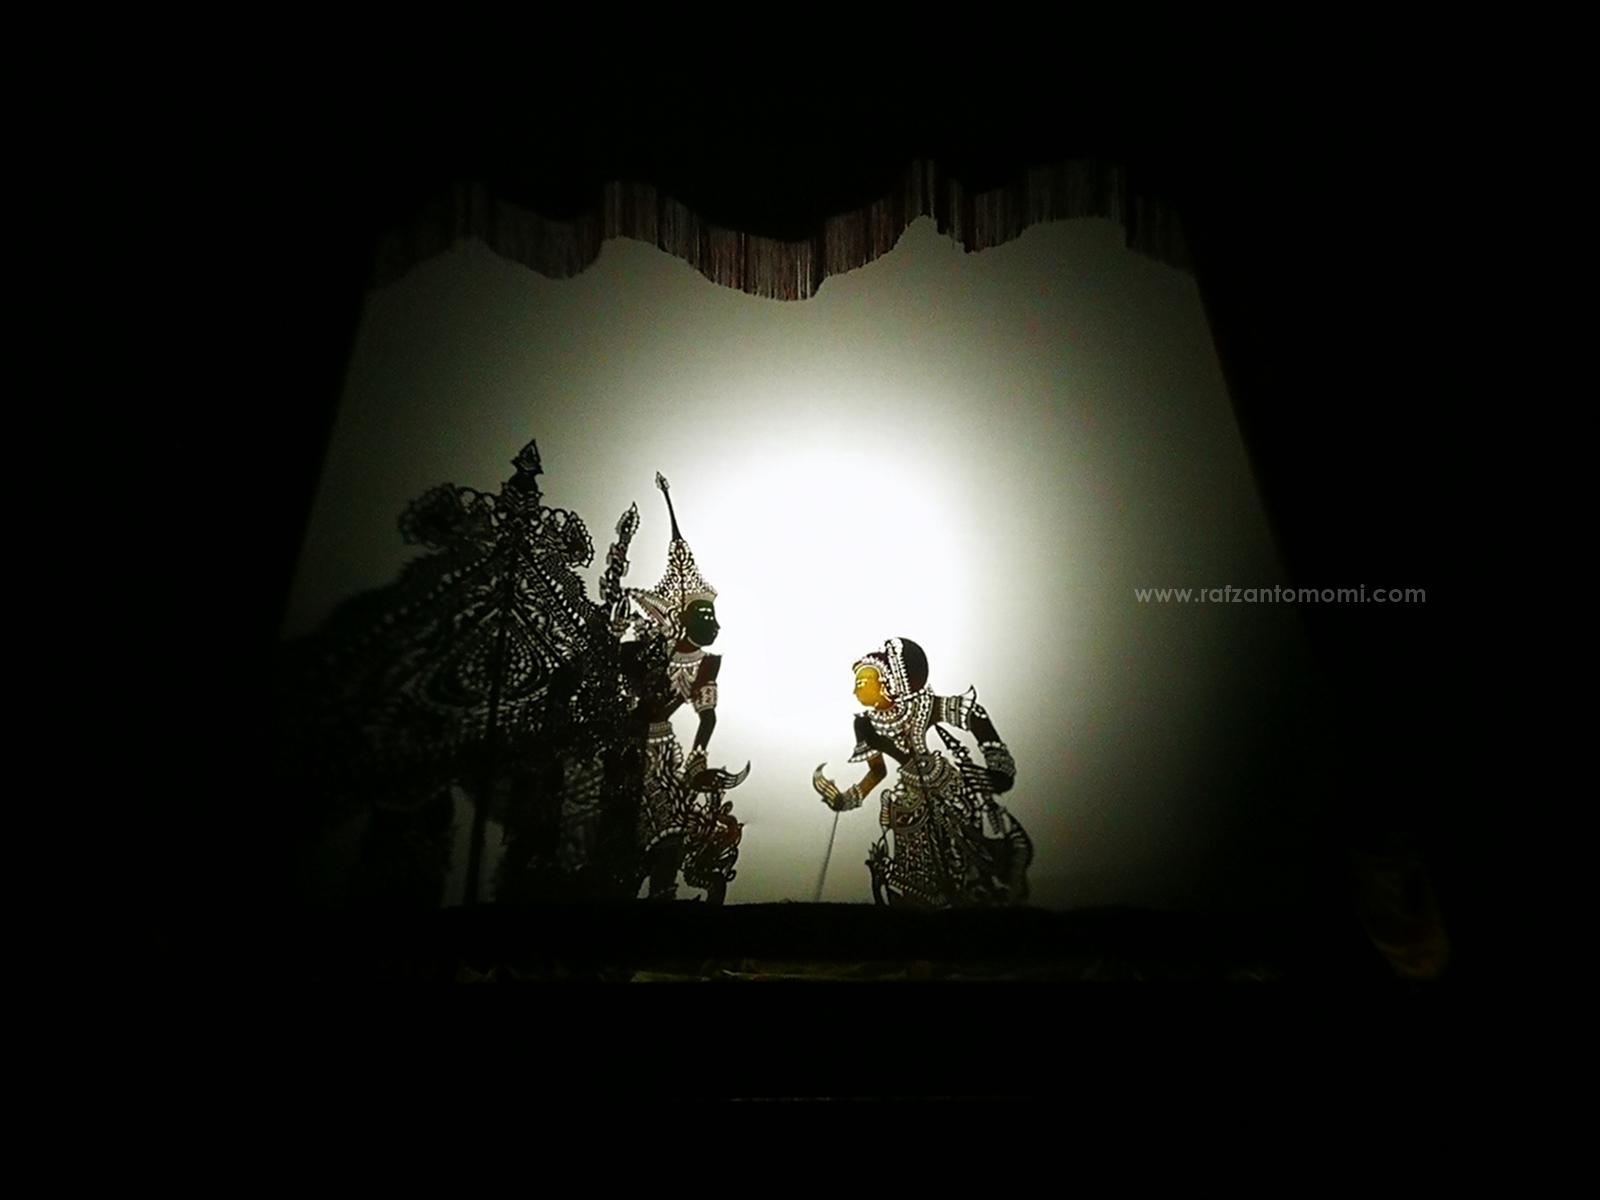 Panggung Seni Tradisional 2018 - JKKN Meneruskan Panggung Seni Tradisional Untuk Tahun 2018!